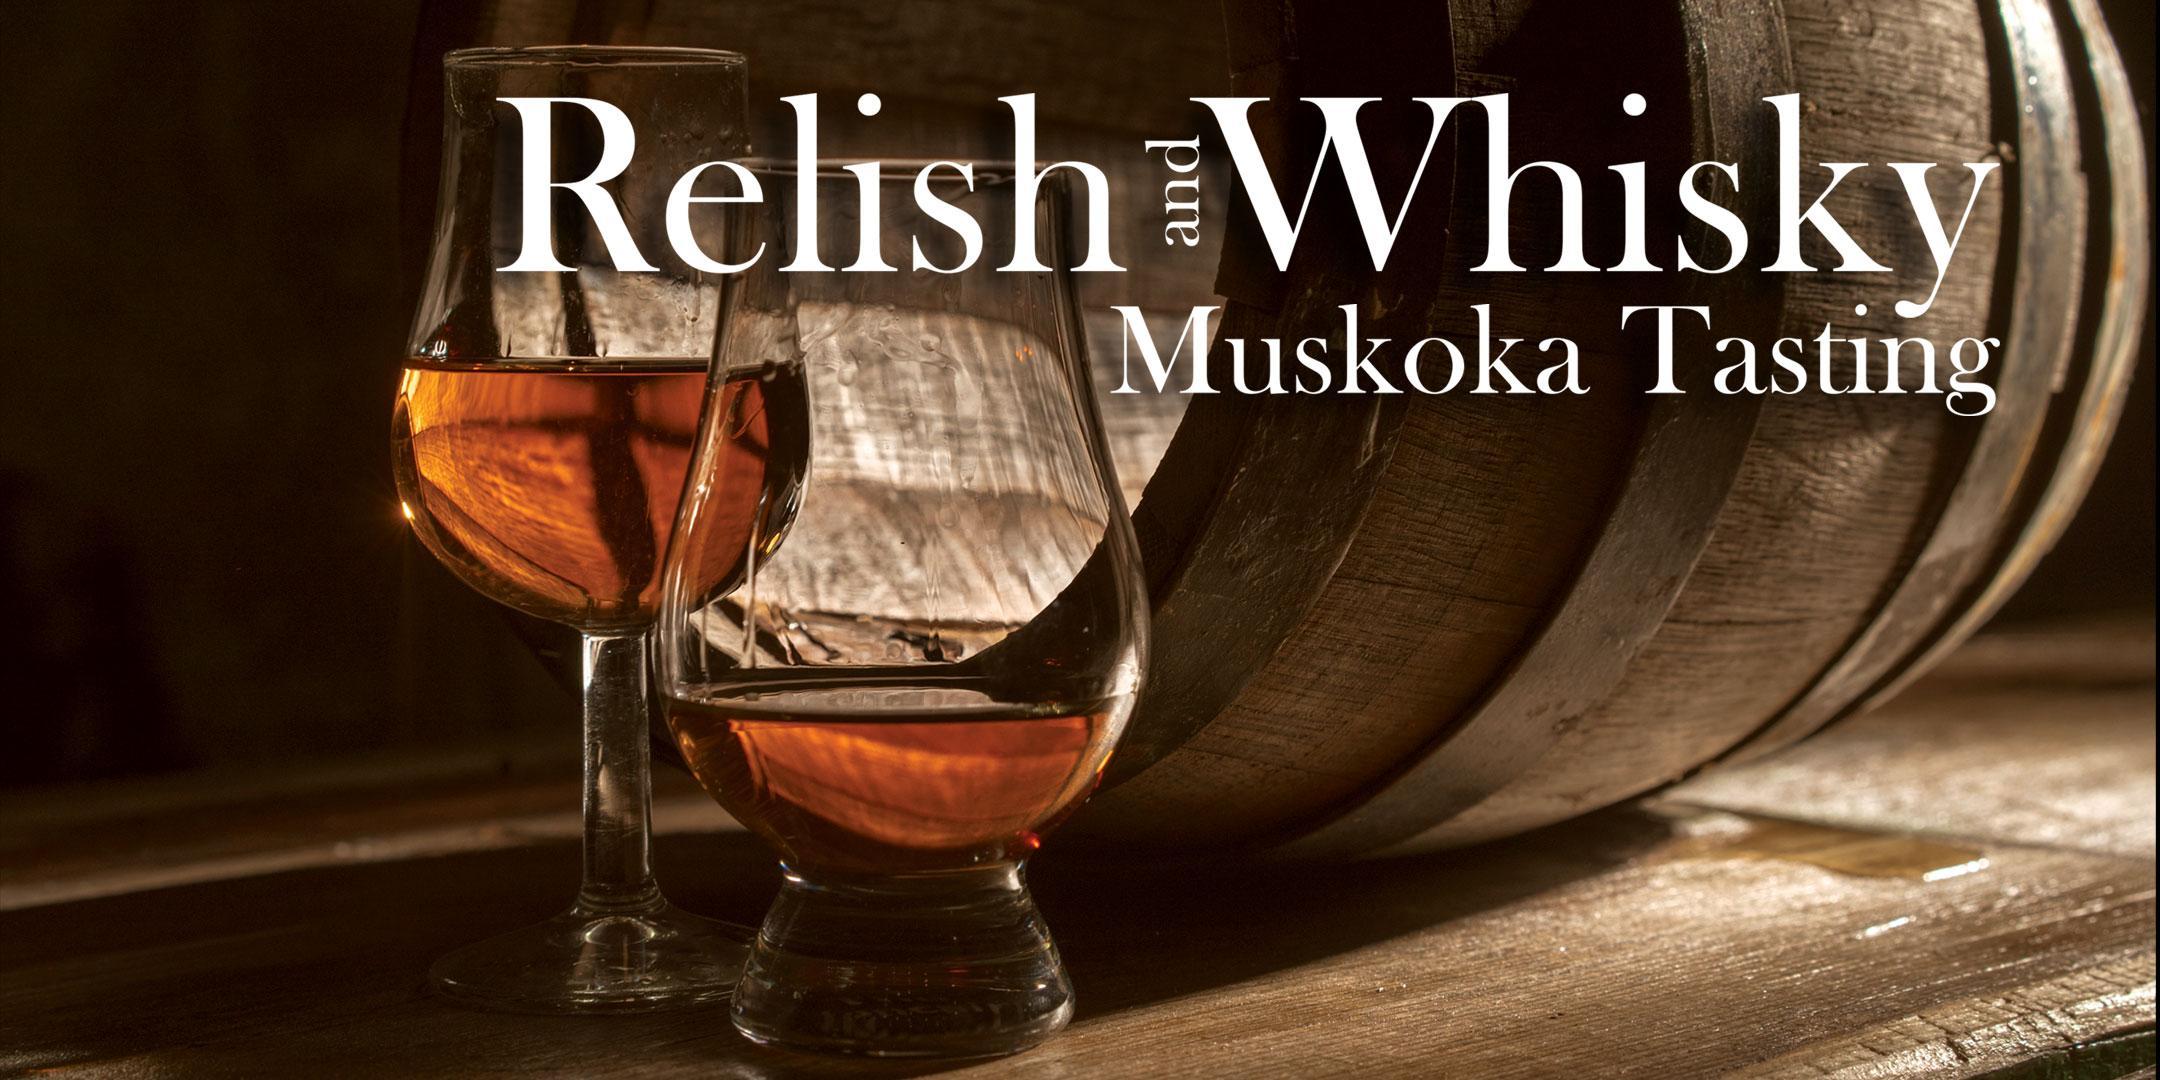 Relish and Whisky Muskoka Tasting